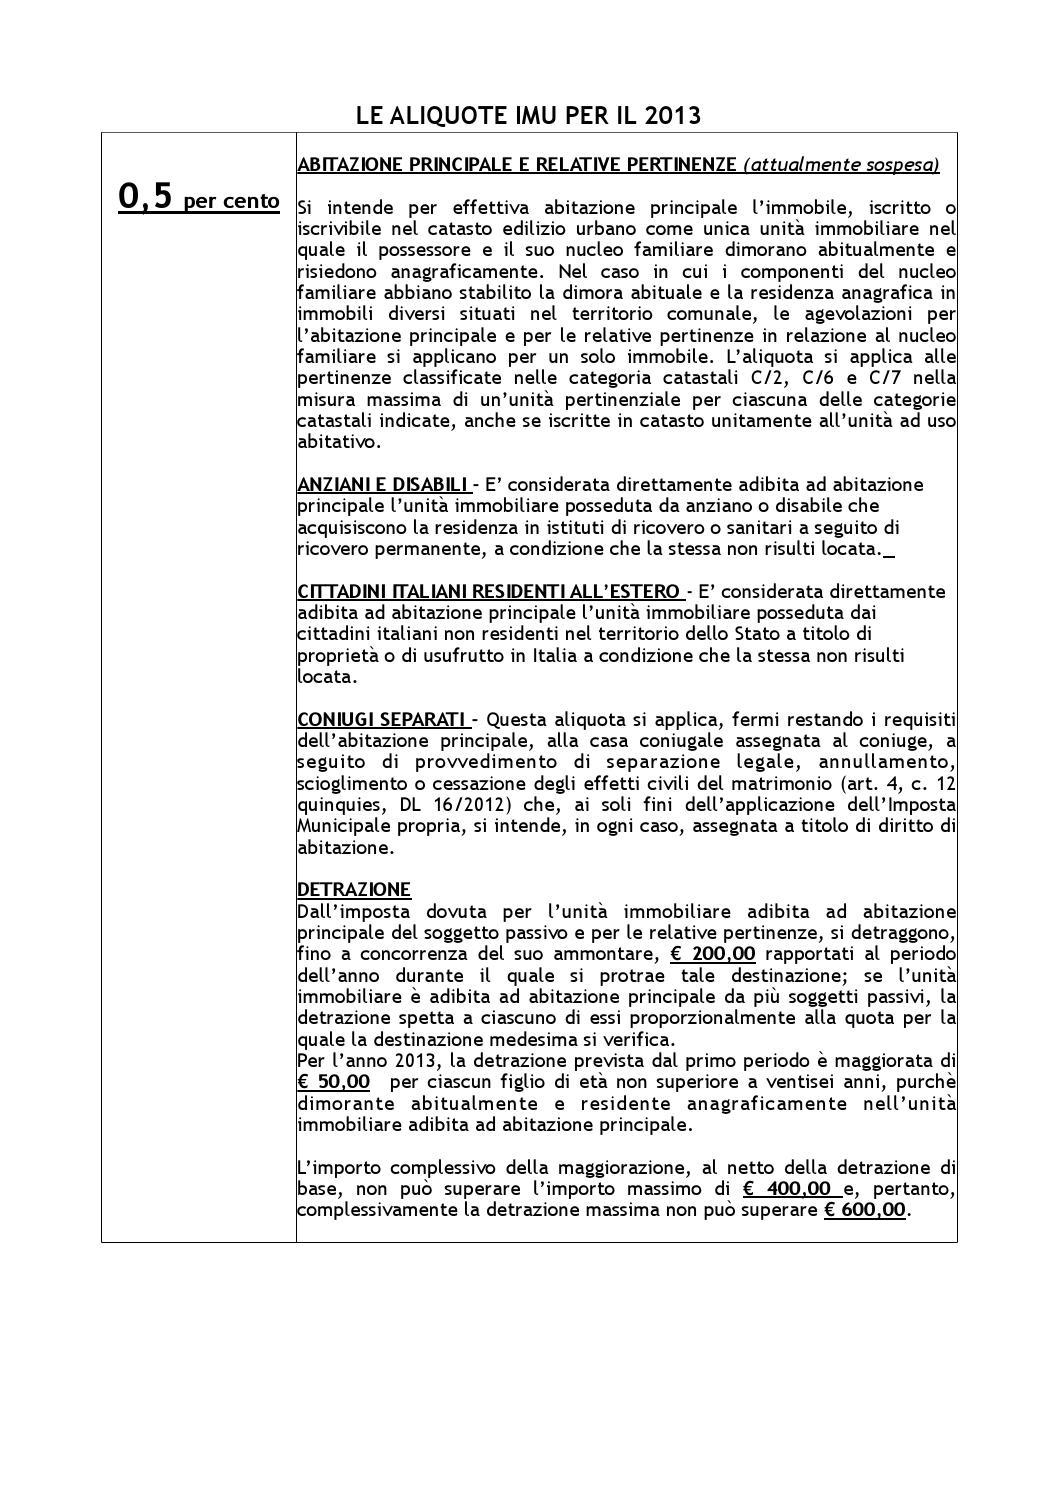 Aliquote 2013 Emilia Imu Di Reggio Comune Issuu By jLqMVzUGpS